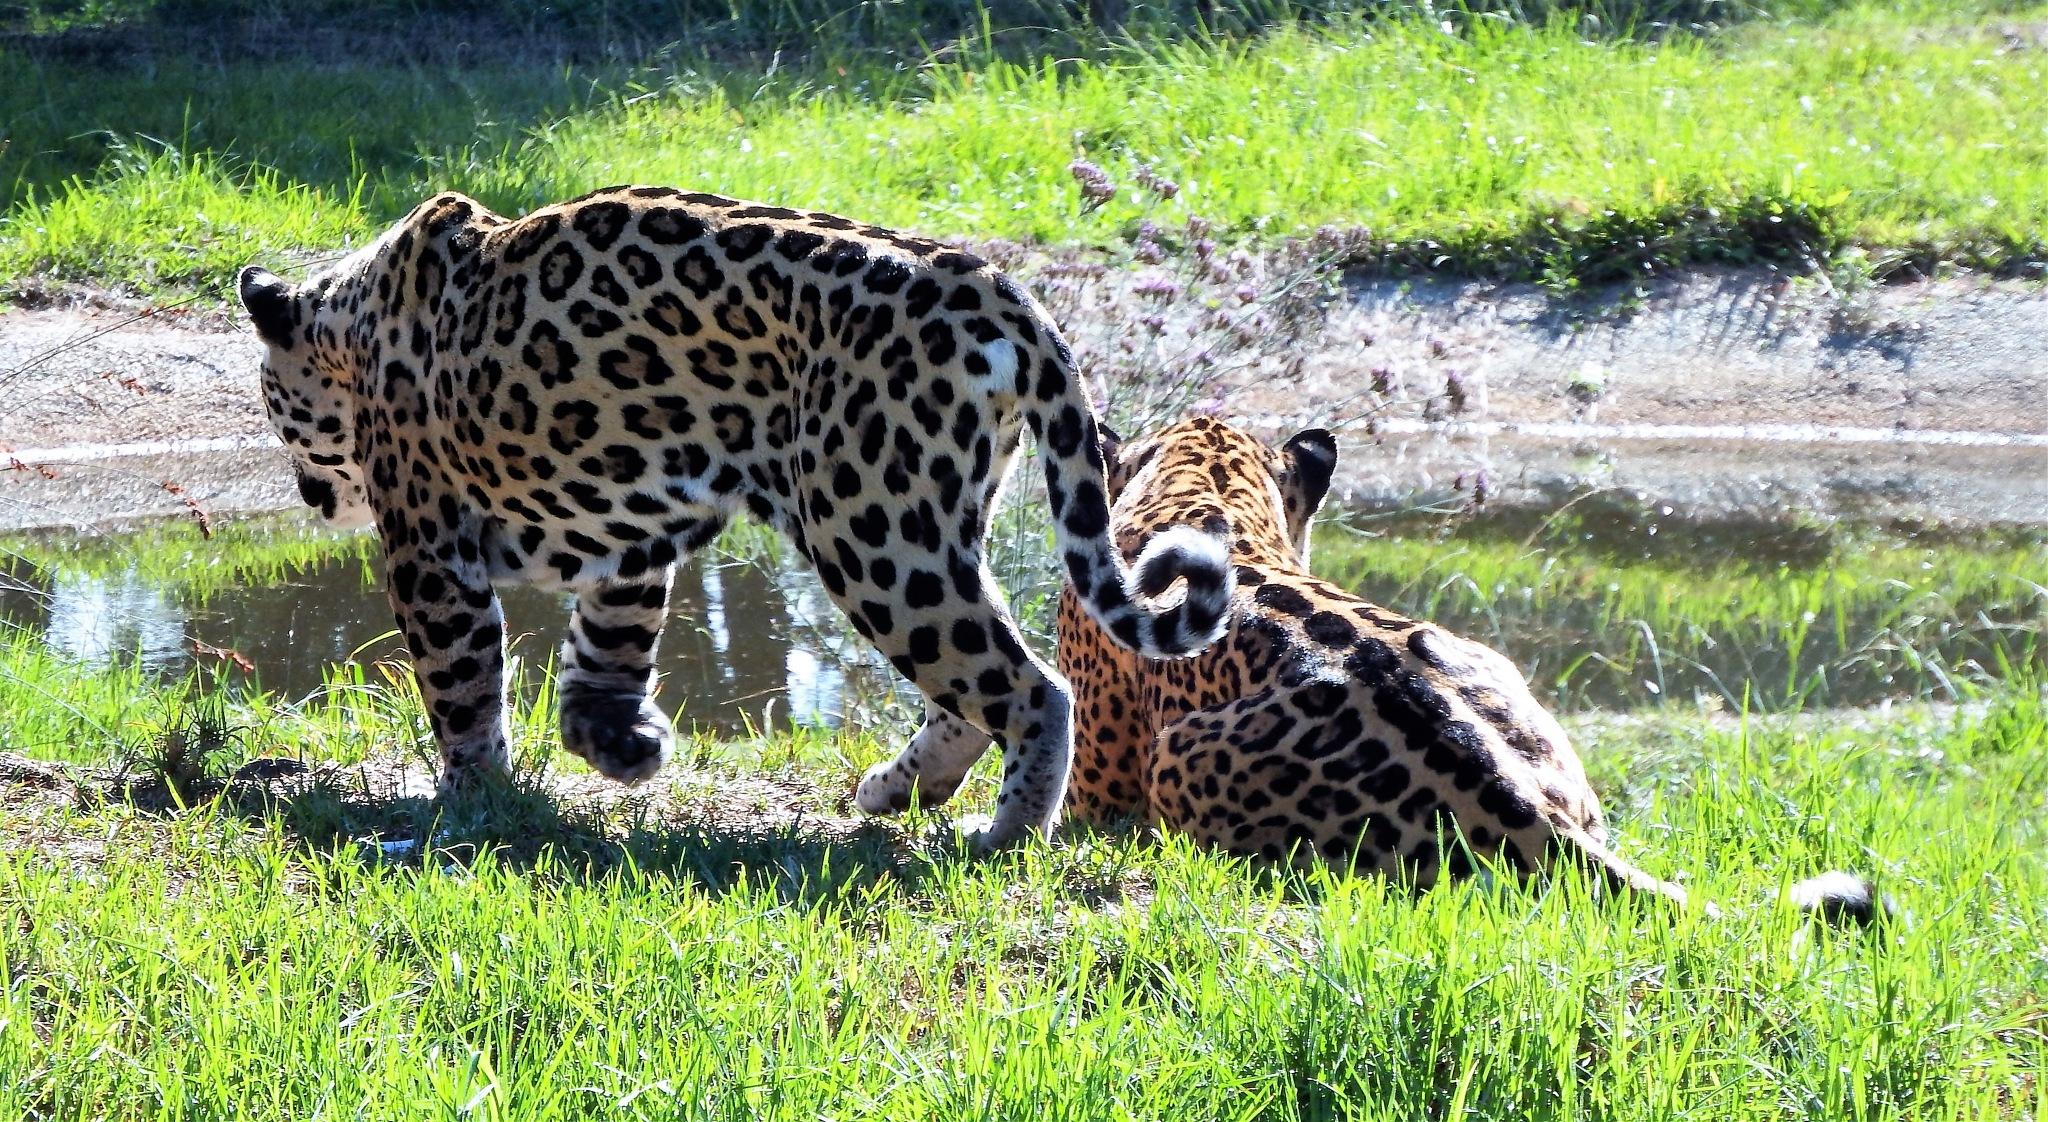 Jaguar joining his mate. by Japie van der Berg